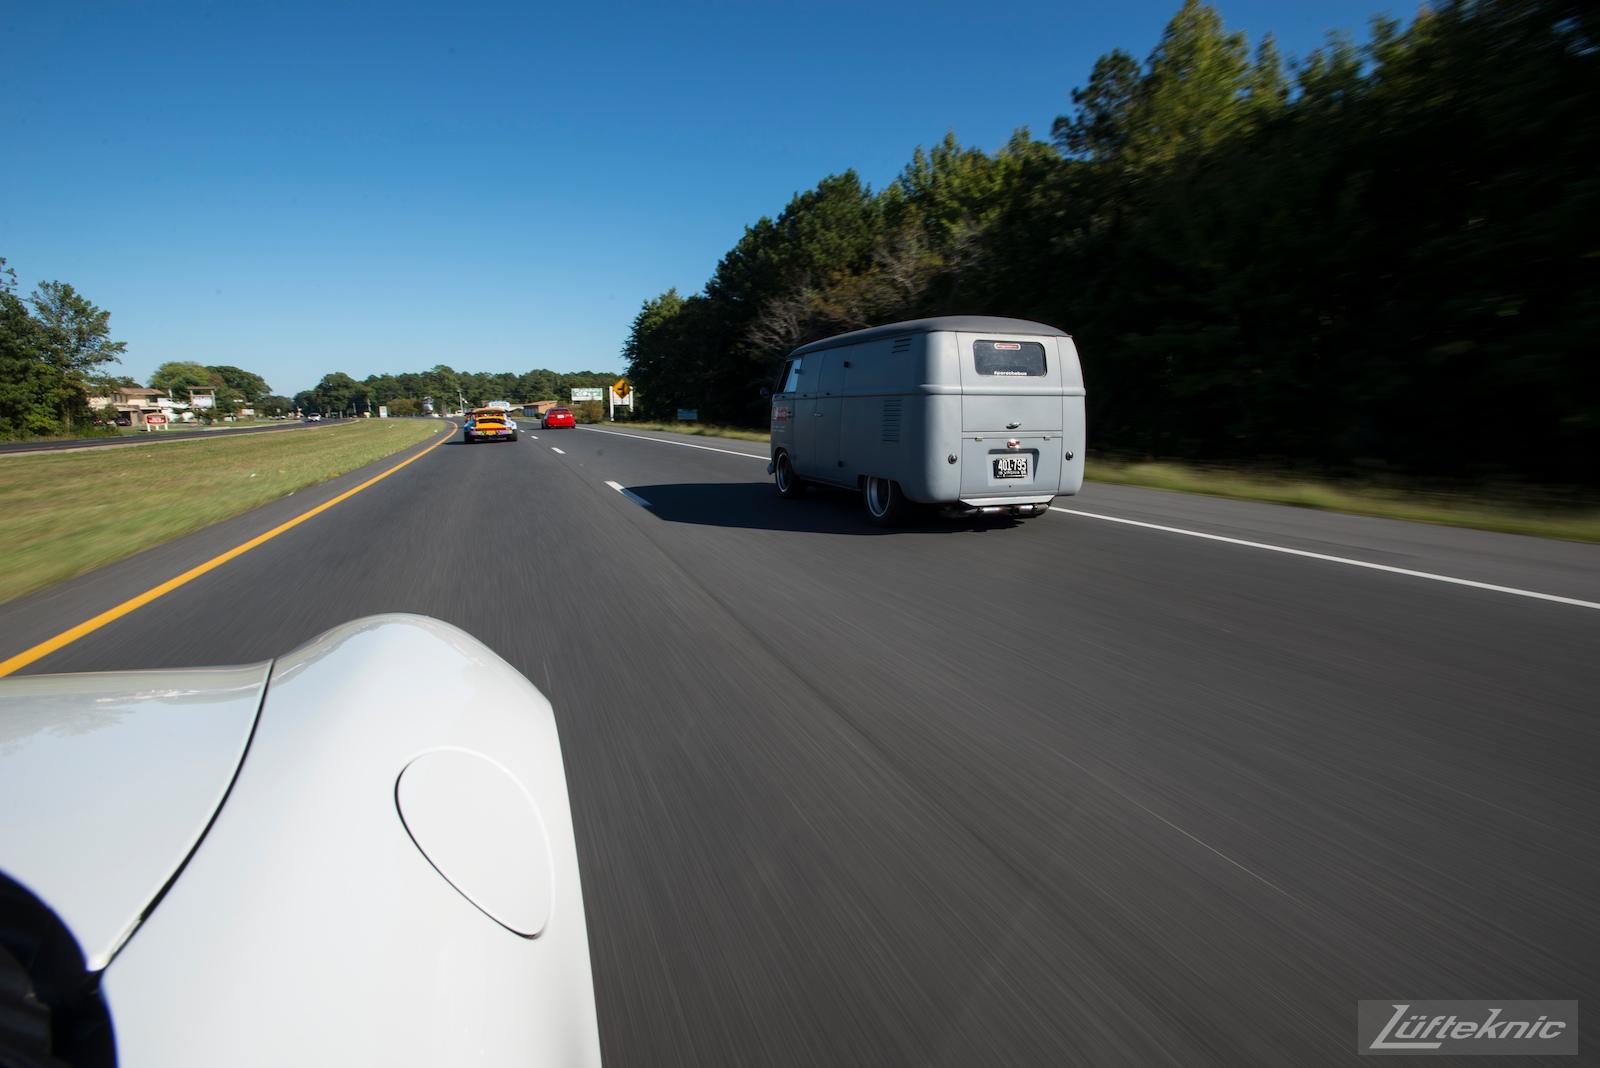 Lüfteknic #projectstuka Porsche 930 Turbo runs down the highway with porschebus behind